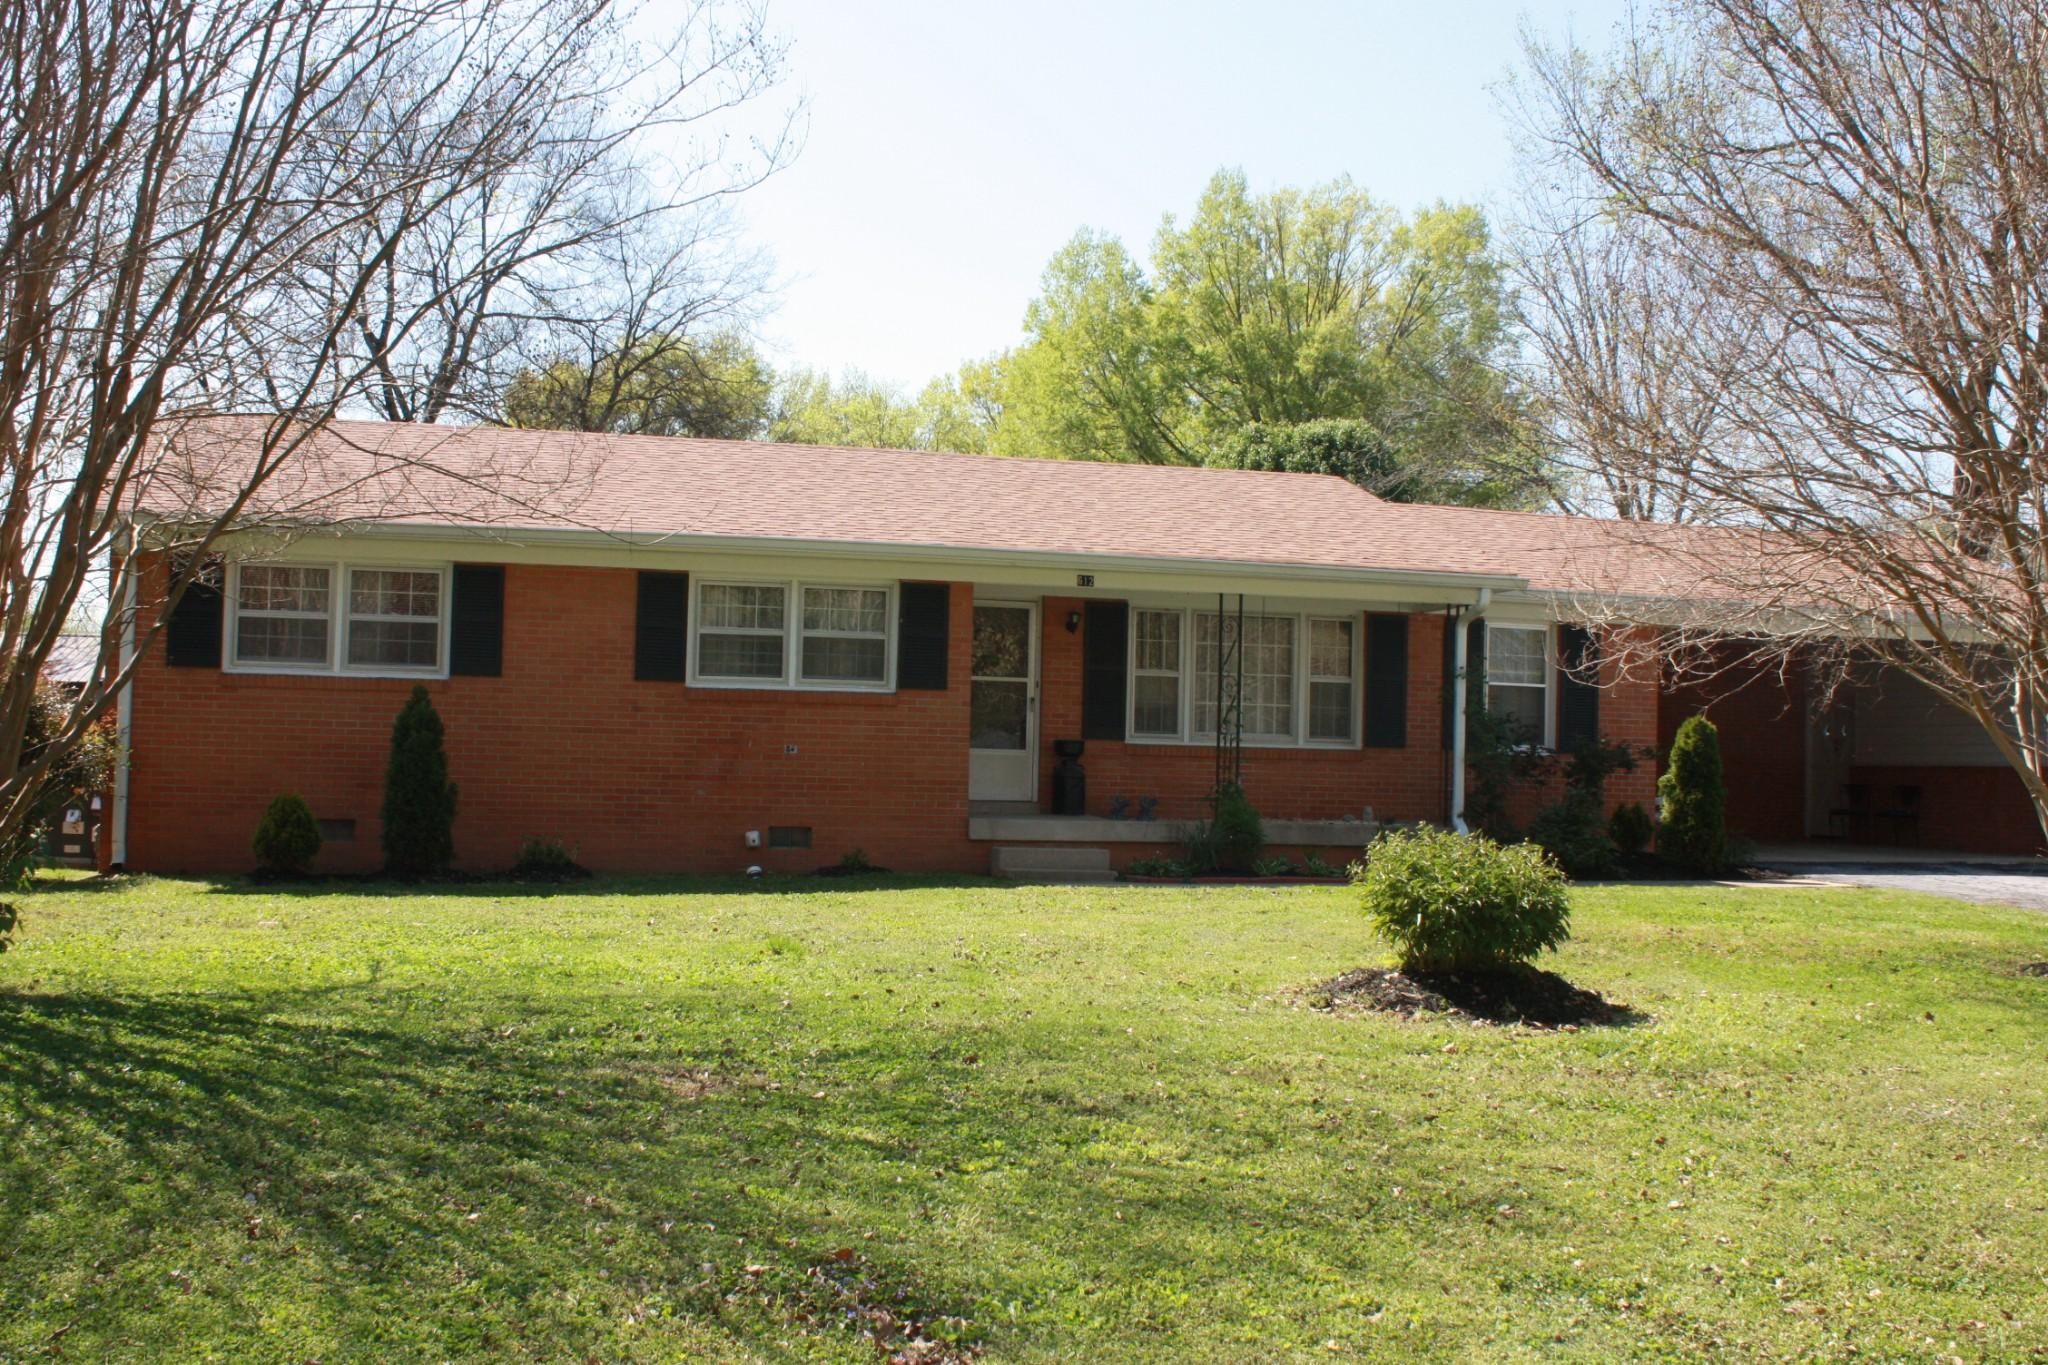 612 Woodcrest St Property Photo - Lewisburg, TN real estate listing